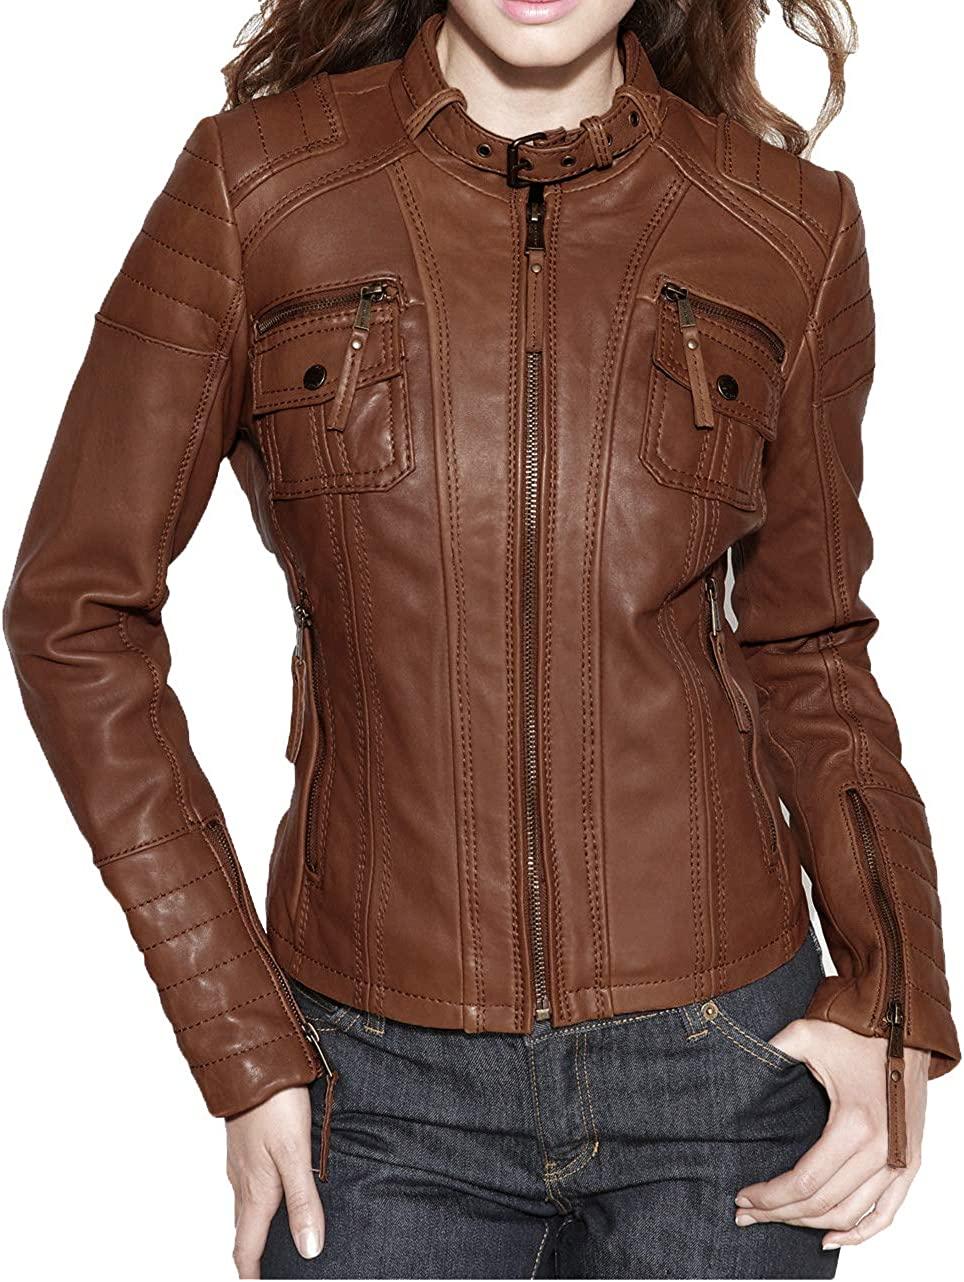 Benjer Skins Women's Leather Jacket Stylish Motorcycle Biker Genuine Lambskin 61